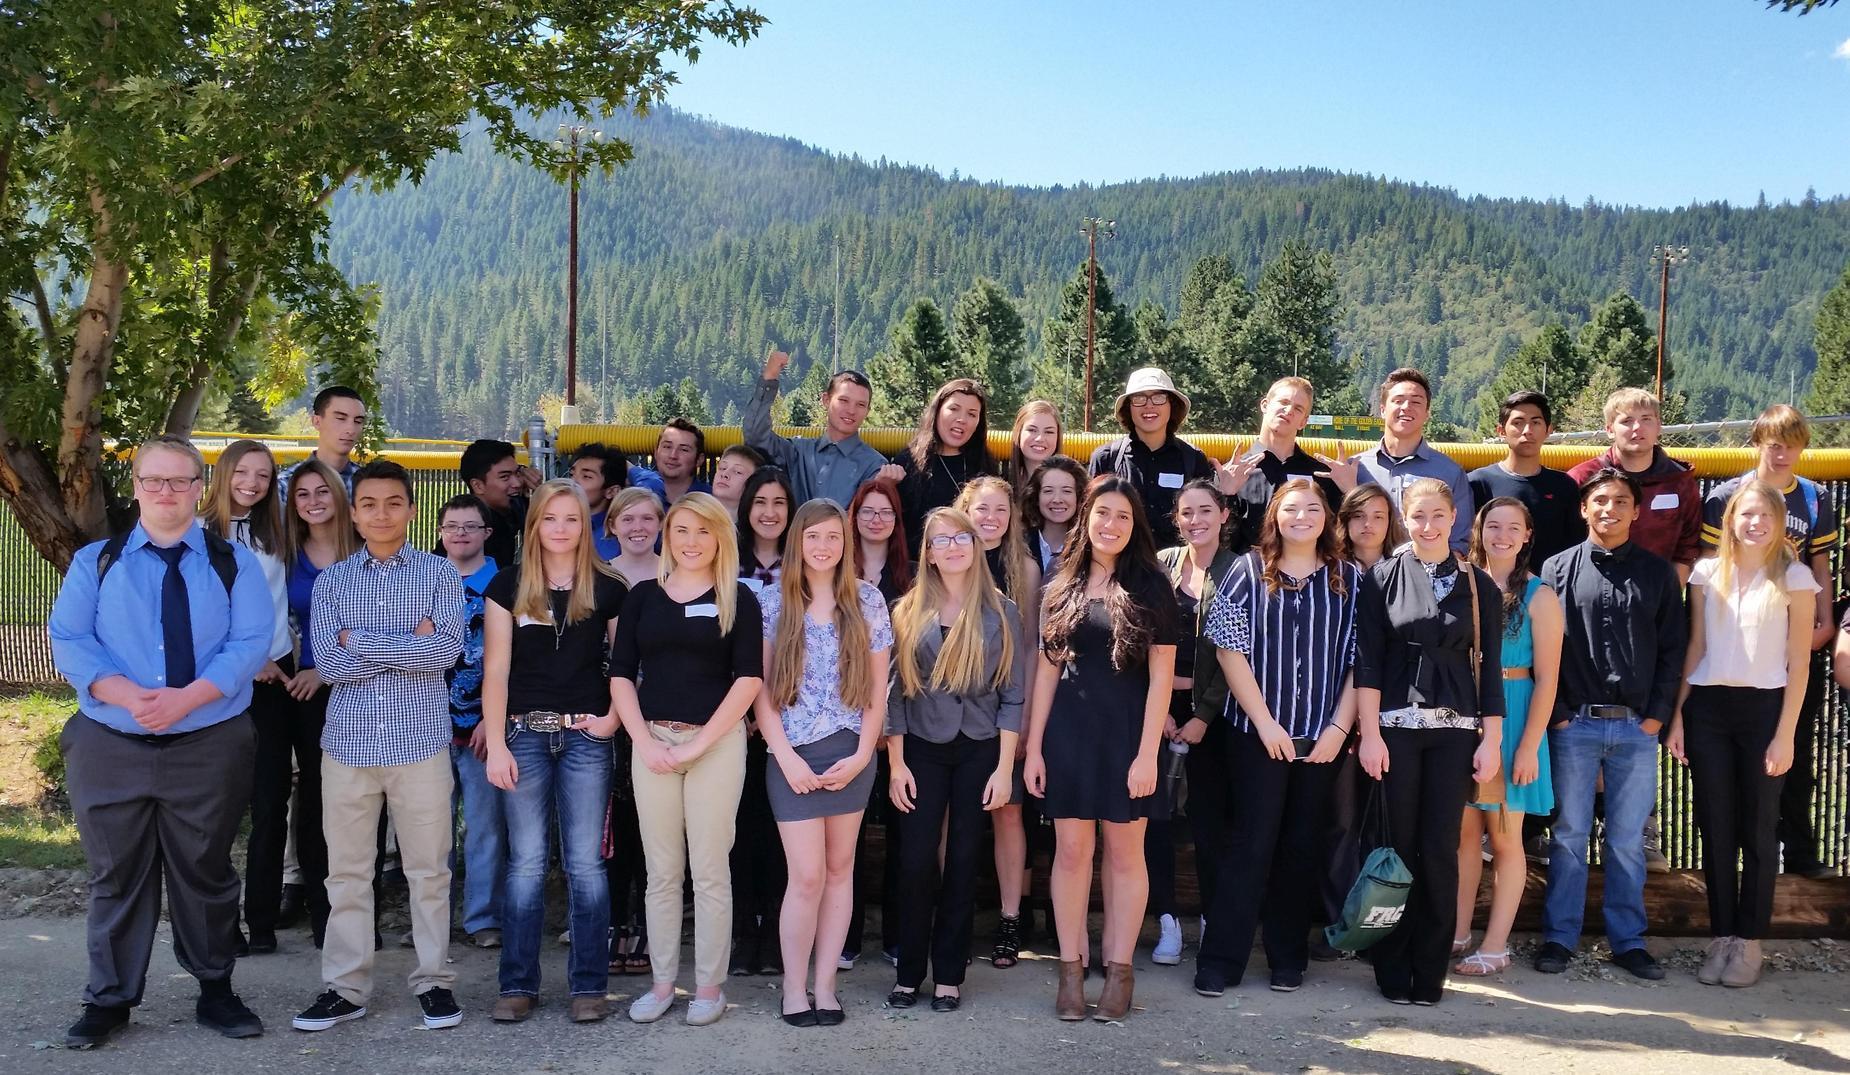 PHS Class of 2017